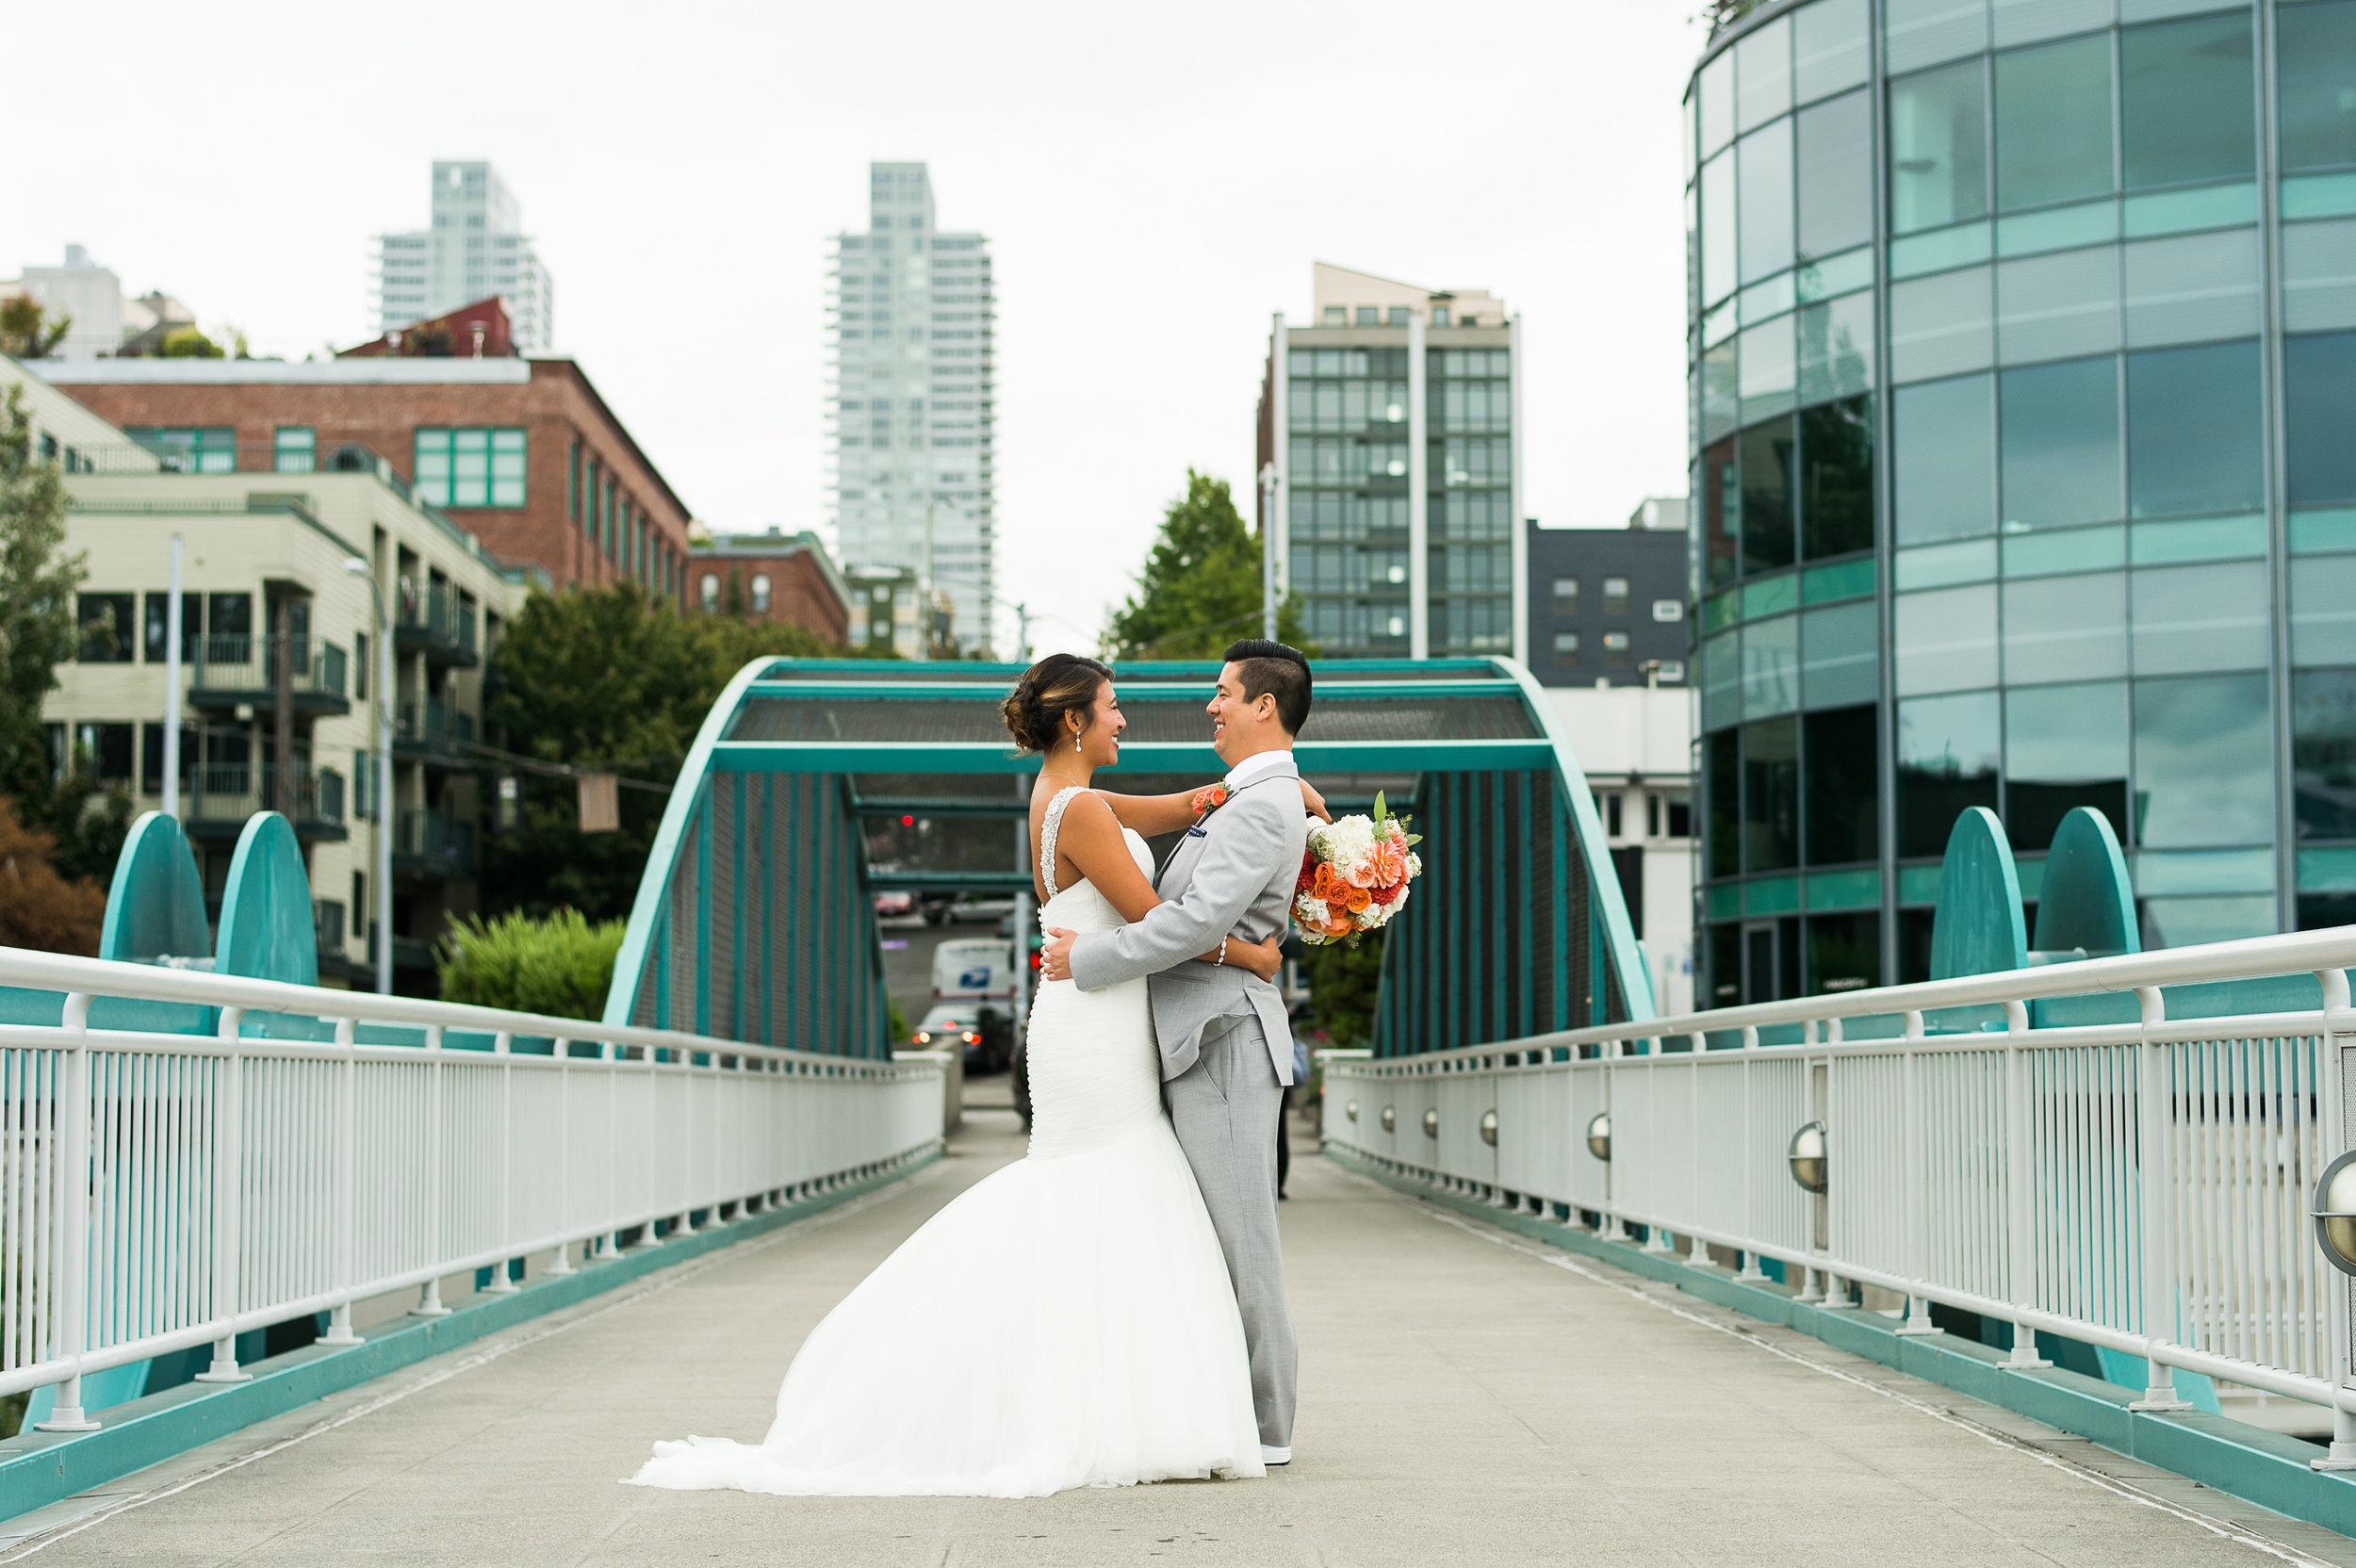 DJ-wedding-Van-Wyhe-Photography-115.jpg